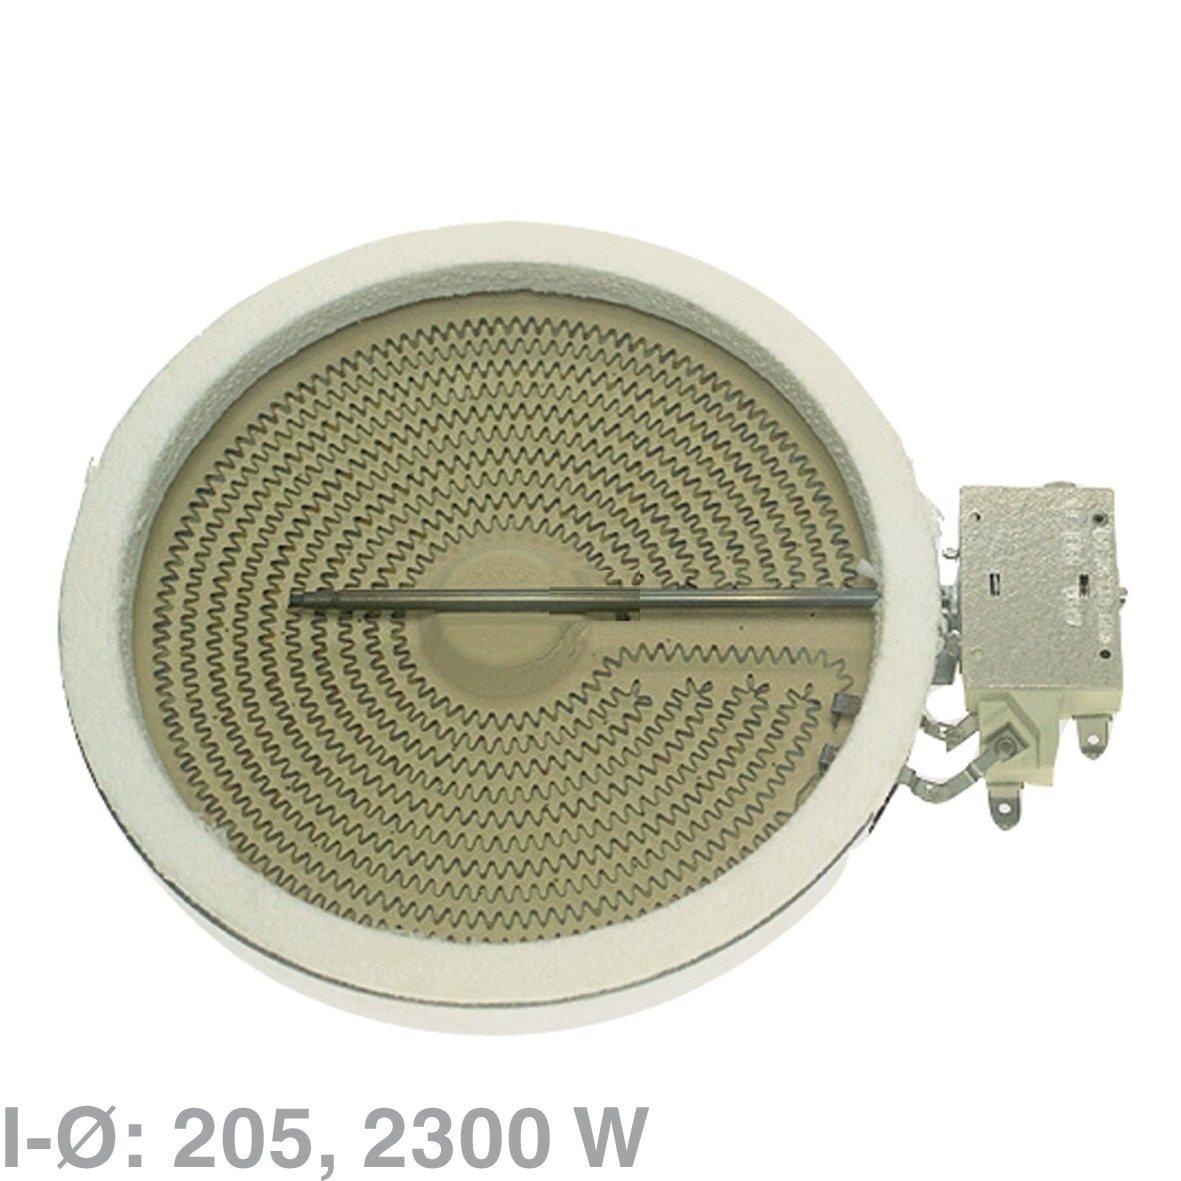 Einkreis HiLight Heizkörper Heizzone 205 mm Ø 2300W 230V Herd EGO 10.51111.004